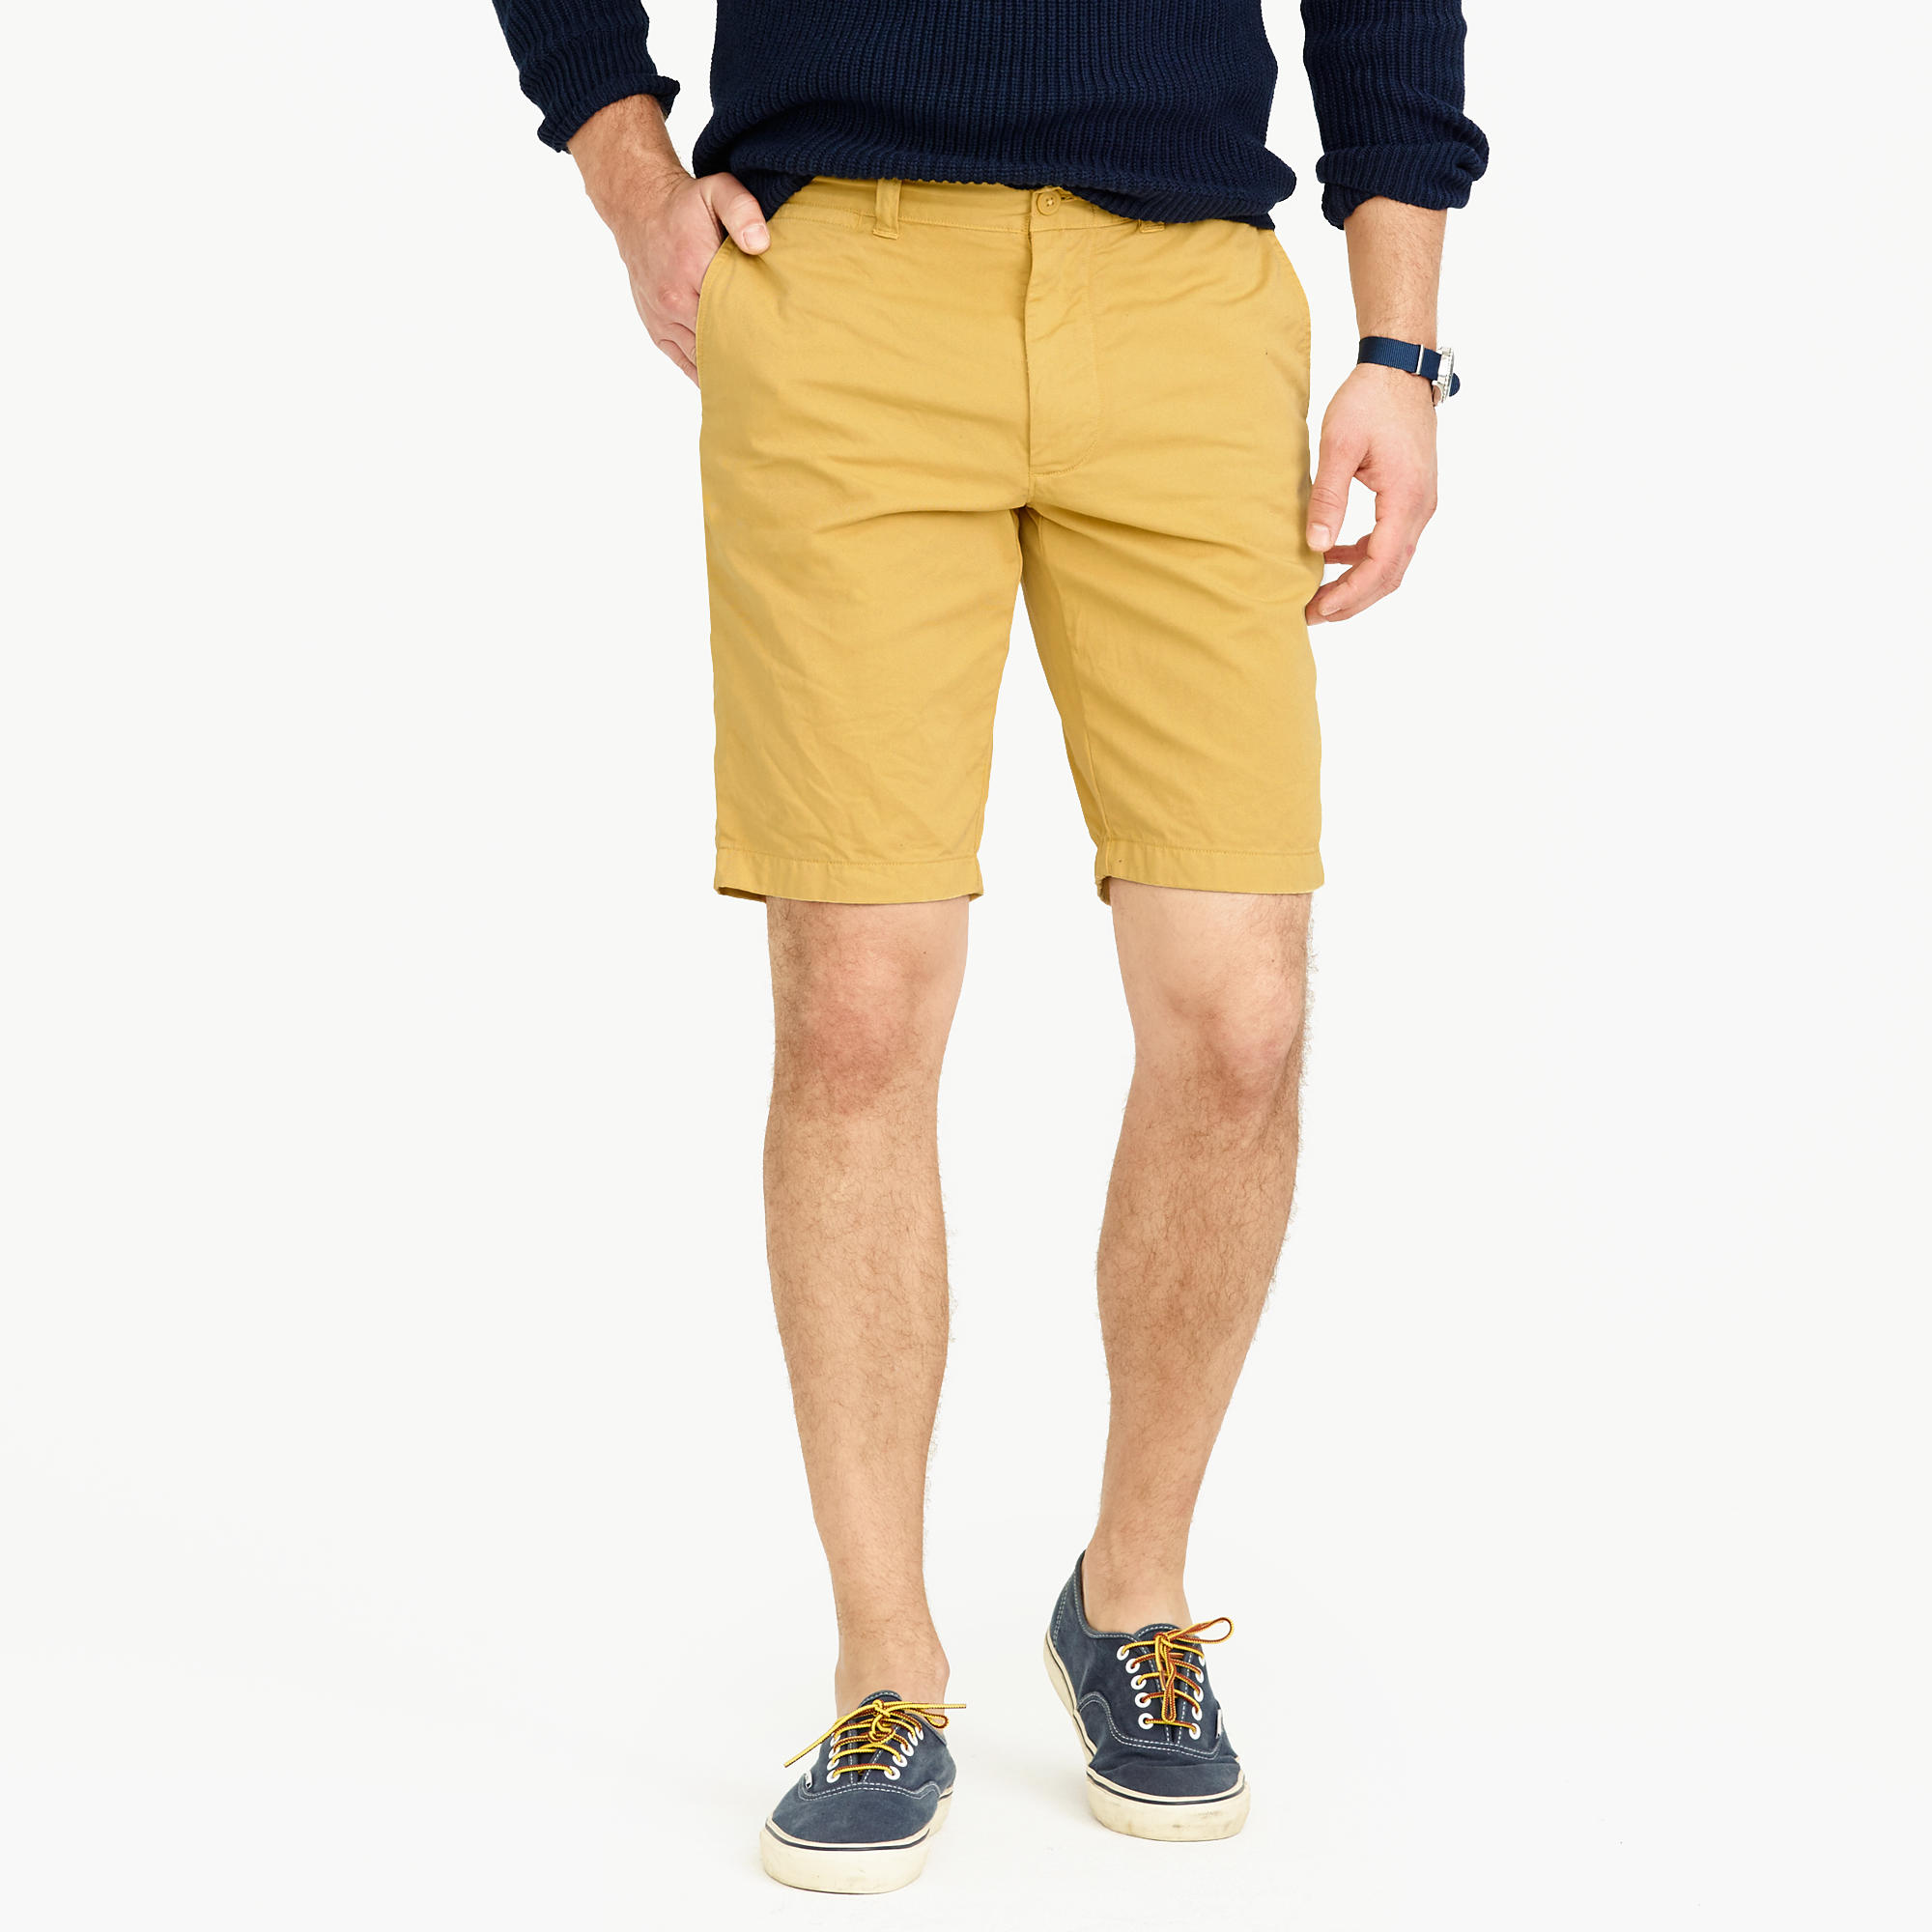 Mens Stanton Shorts : Mens Shorts | J.Crew